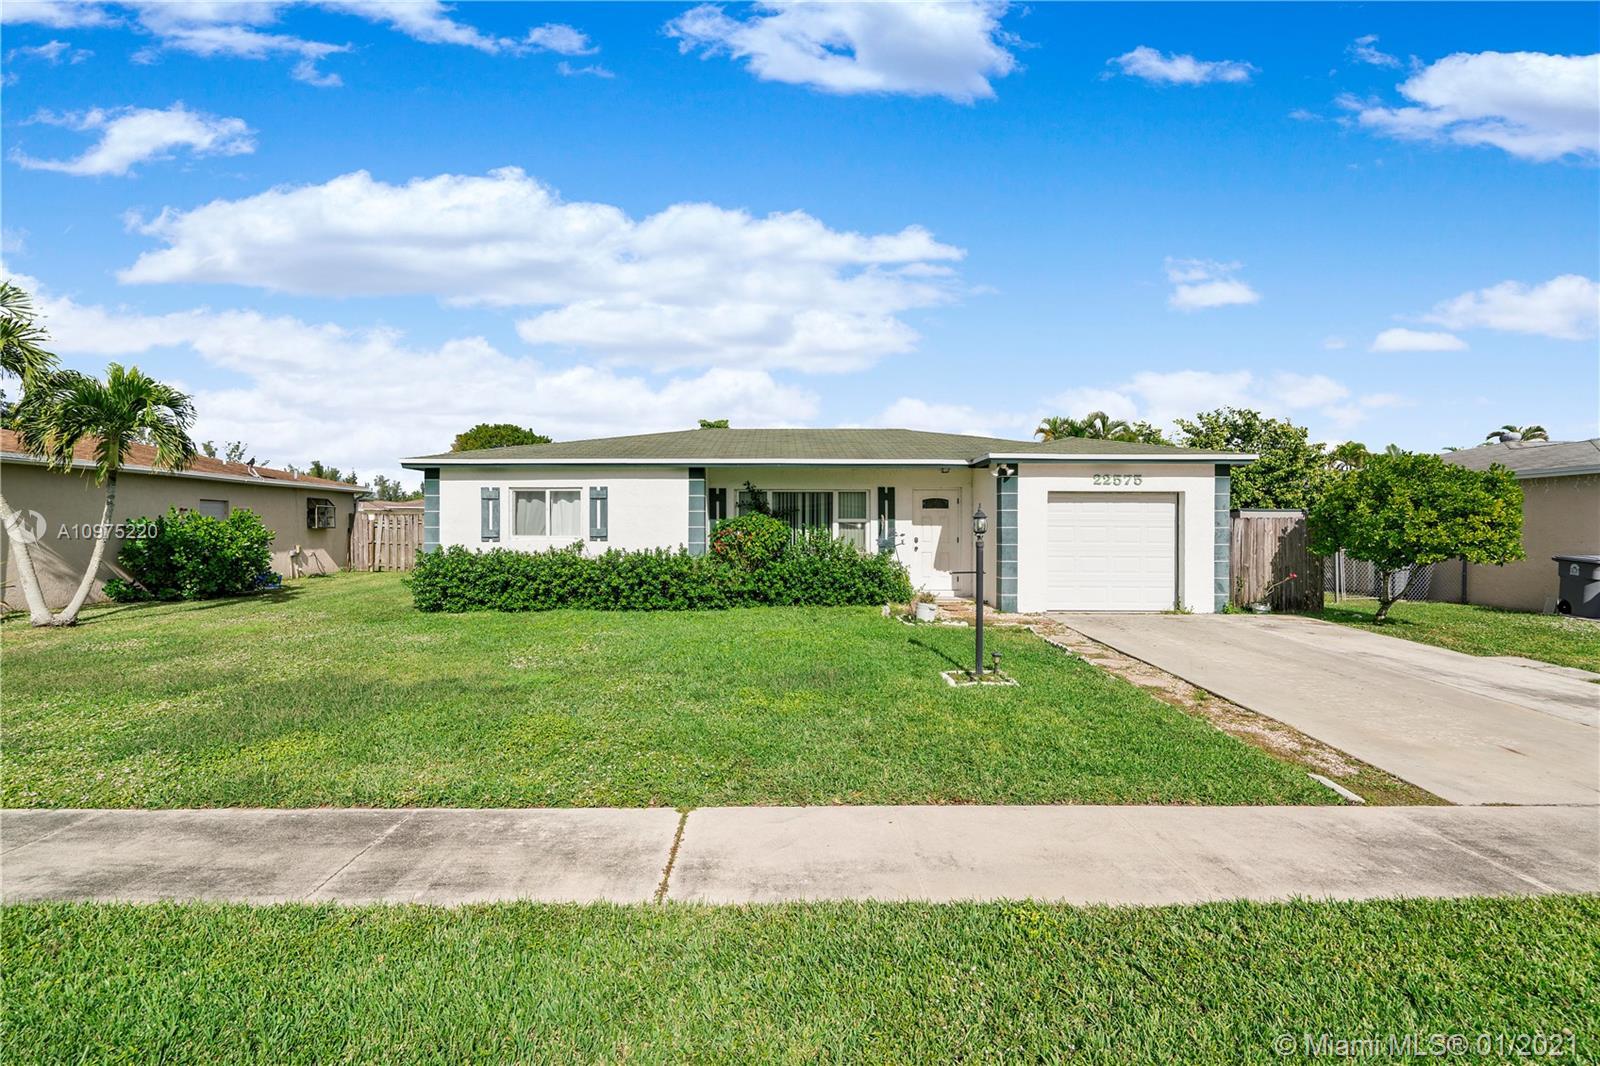 Property for sale at 22575 Lanyard St, Boca Raton,  Florida 33428